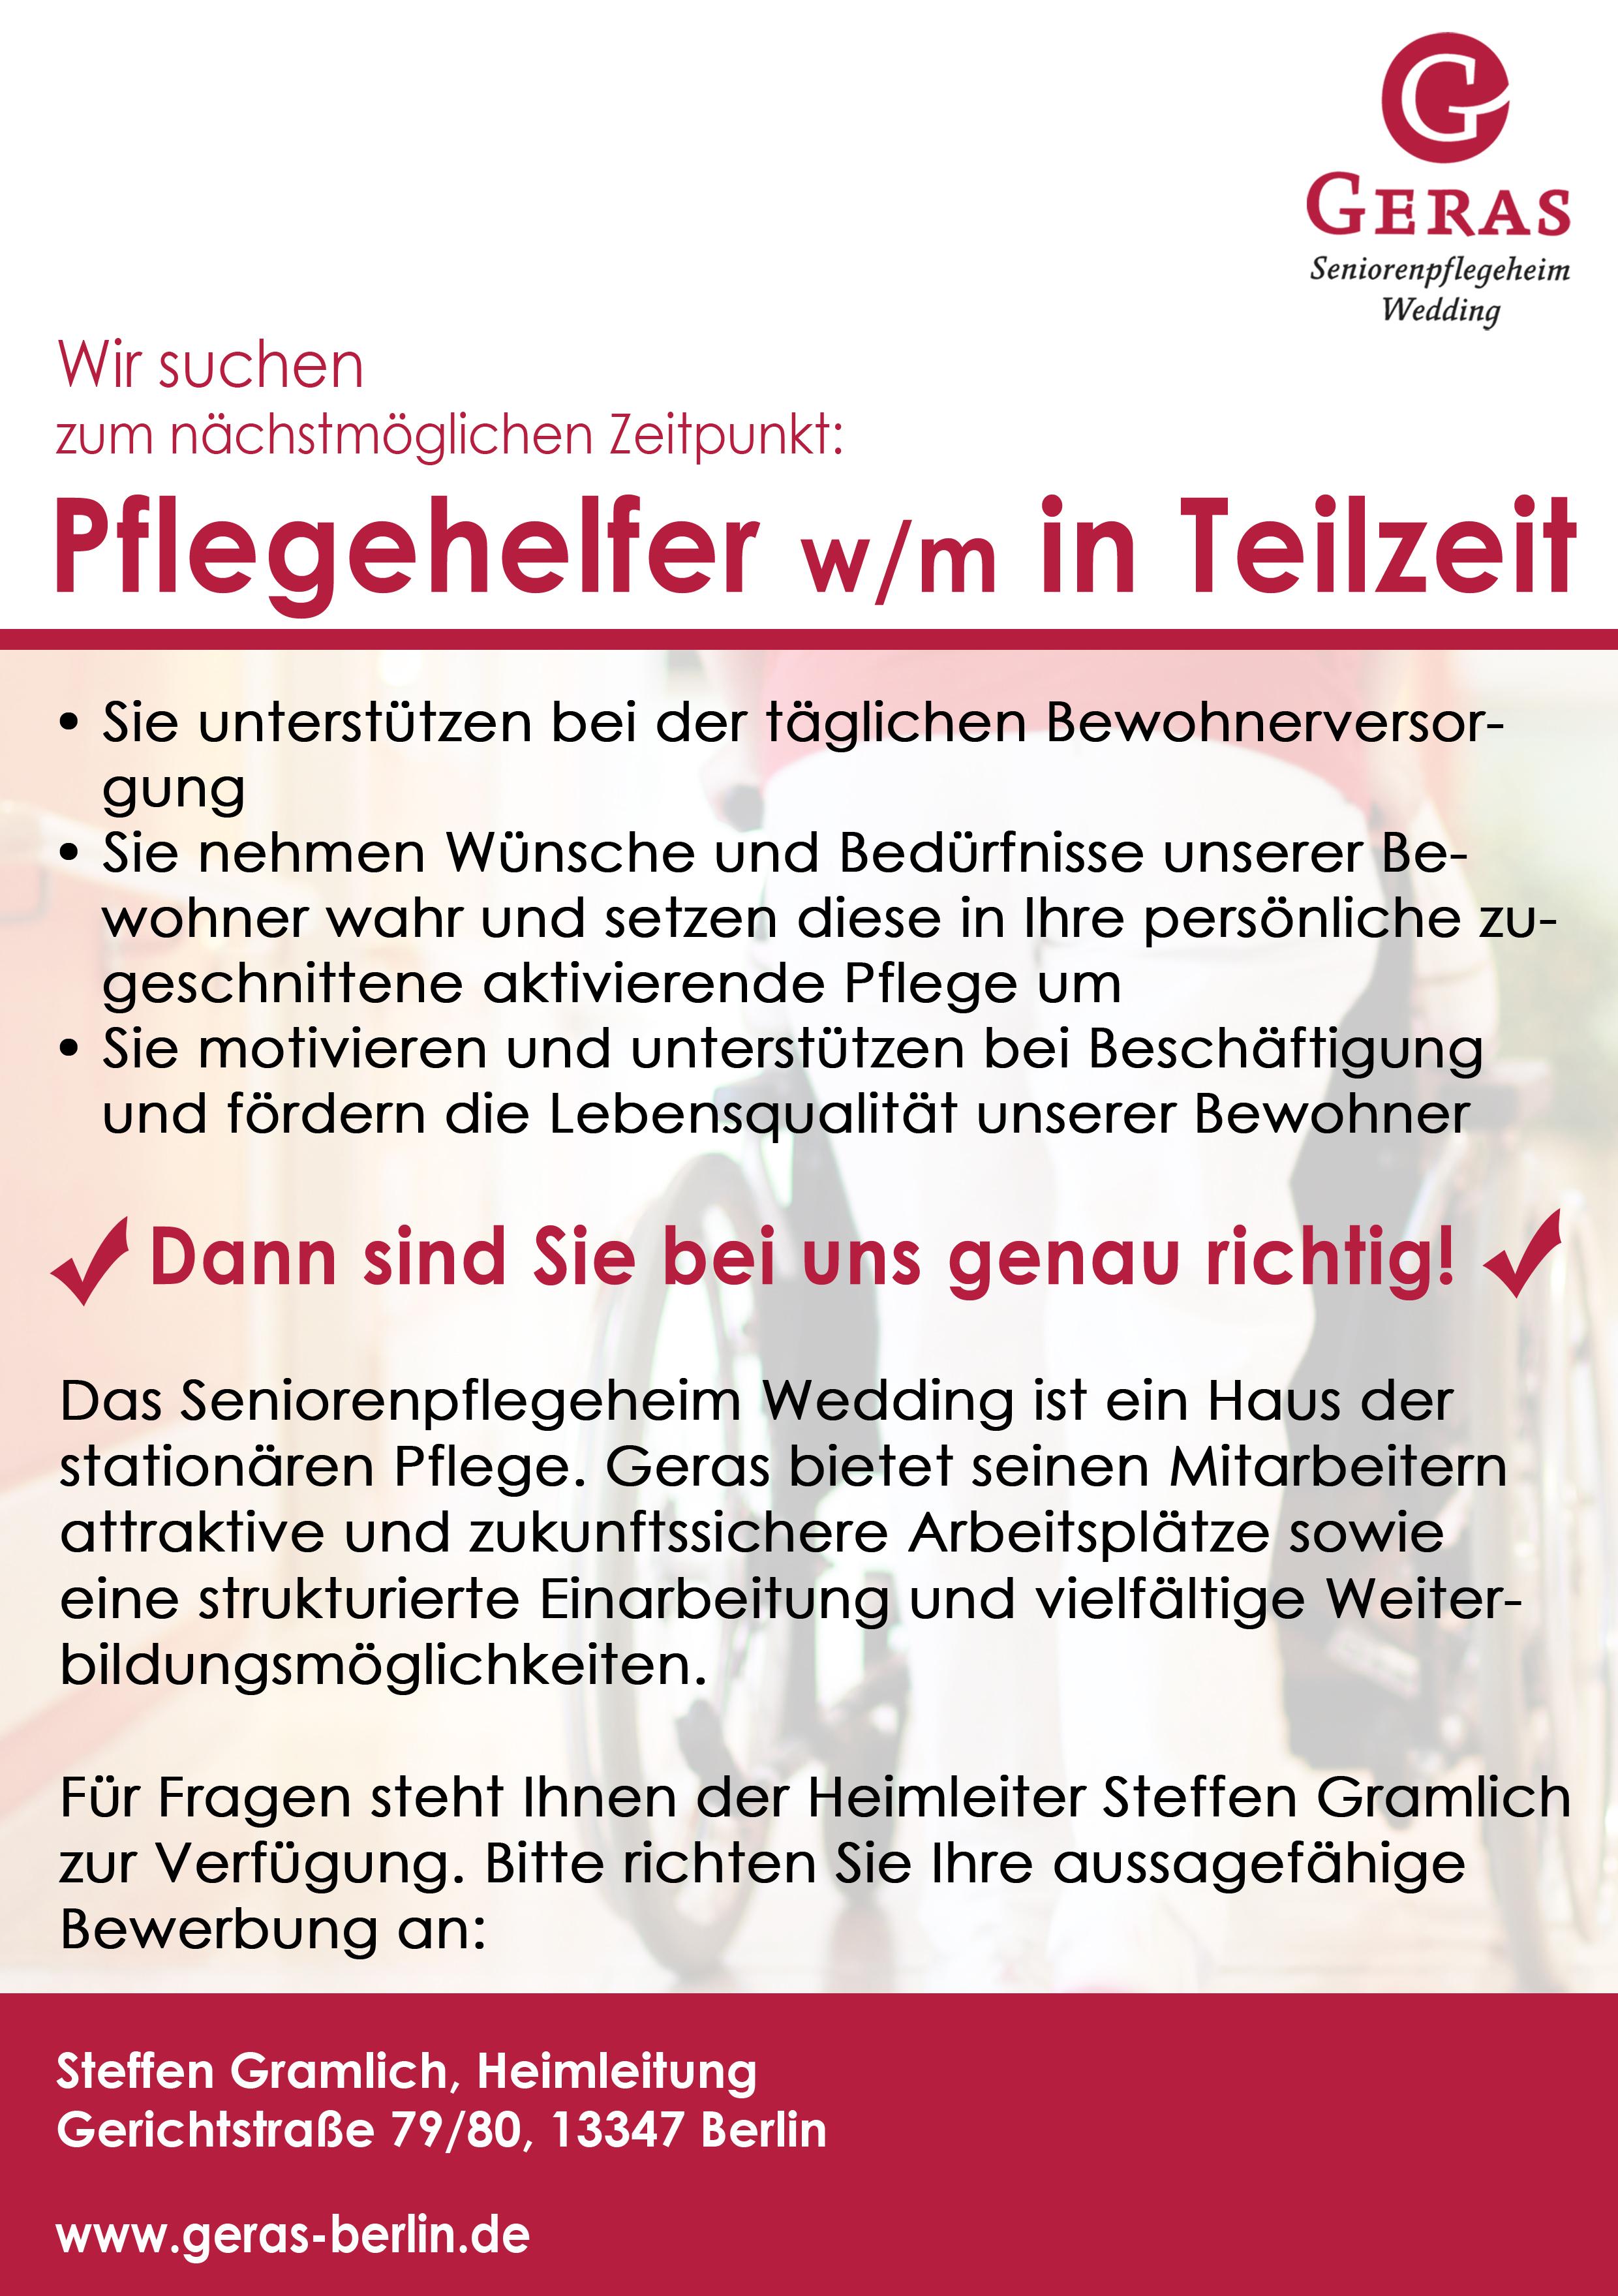 seniorenpflegeheim wedding interviews fotos. Black Bedroom Furniture Sets. Home Design Ideas